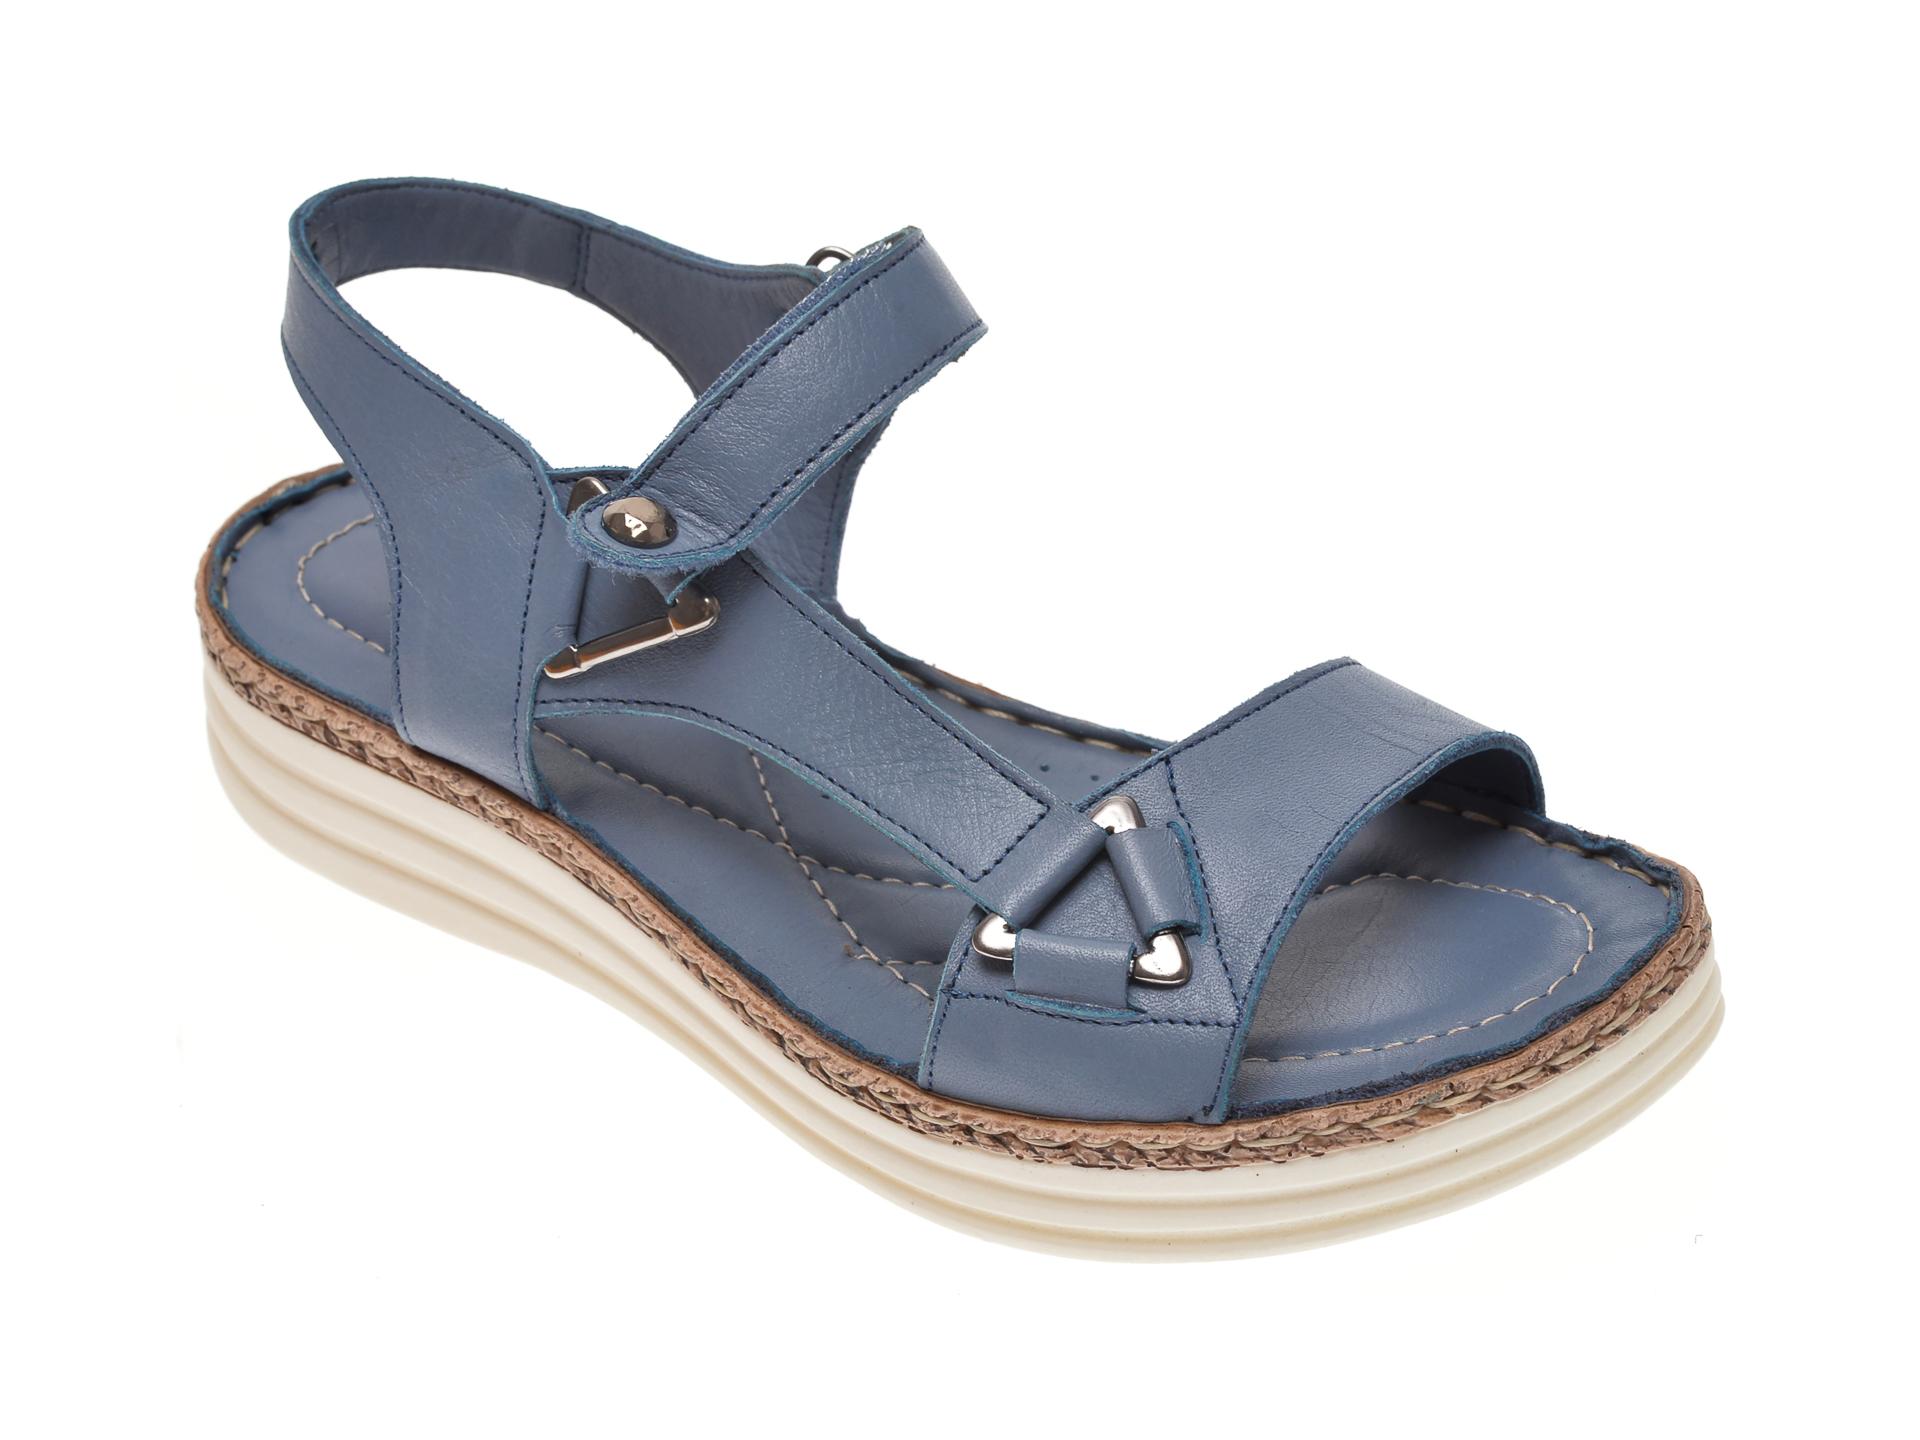 Sandale X TREND albastre, 513, din piele naturala